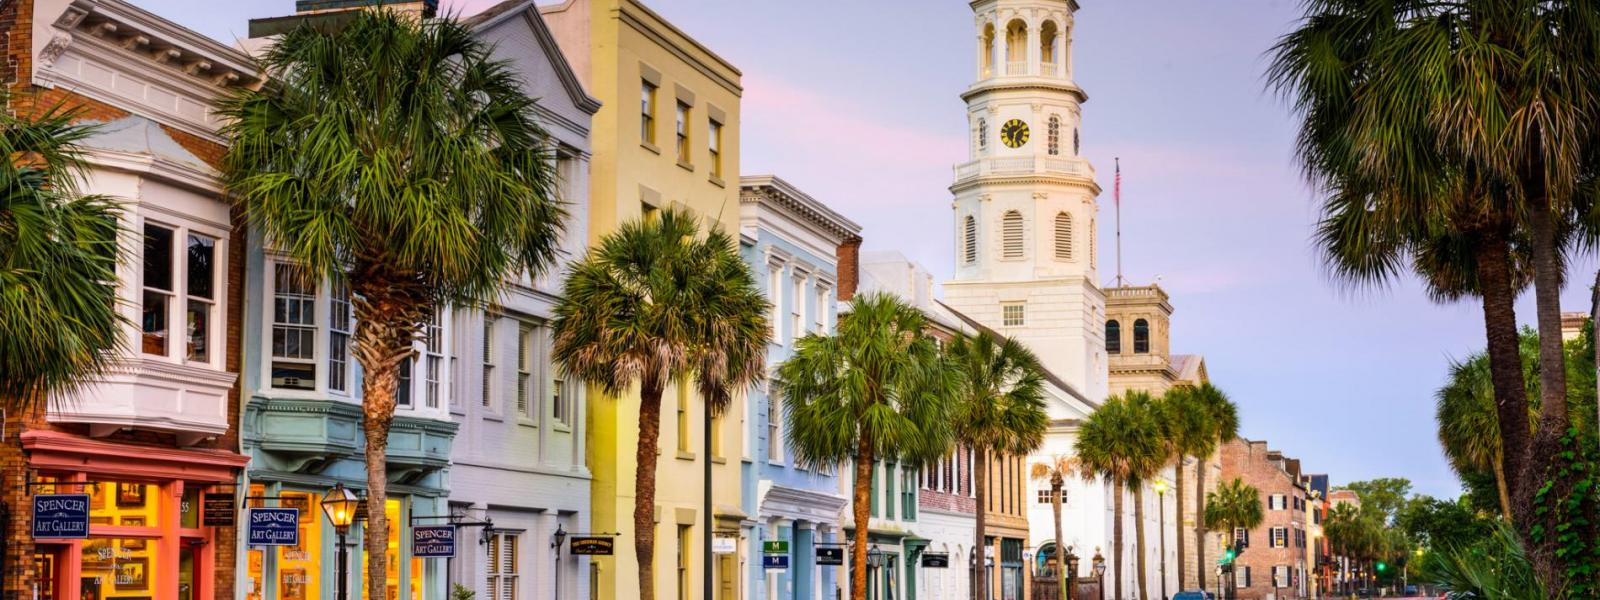 Charleston Broad Street